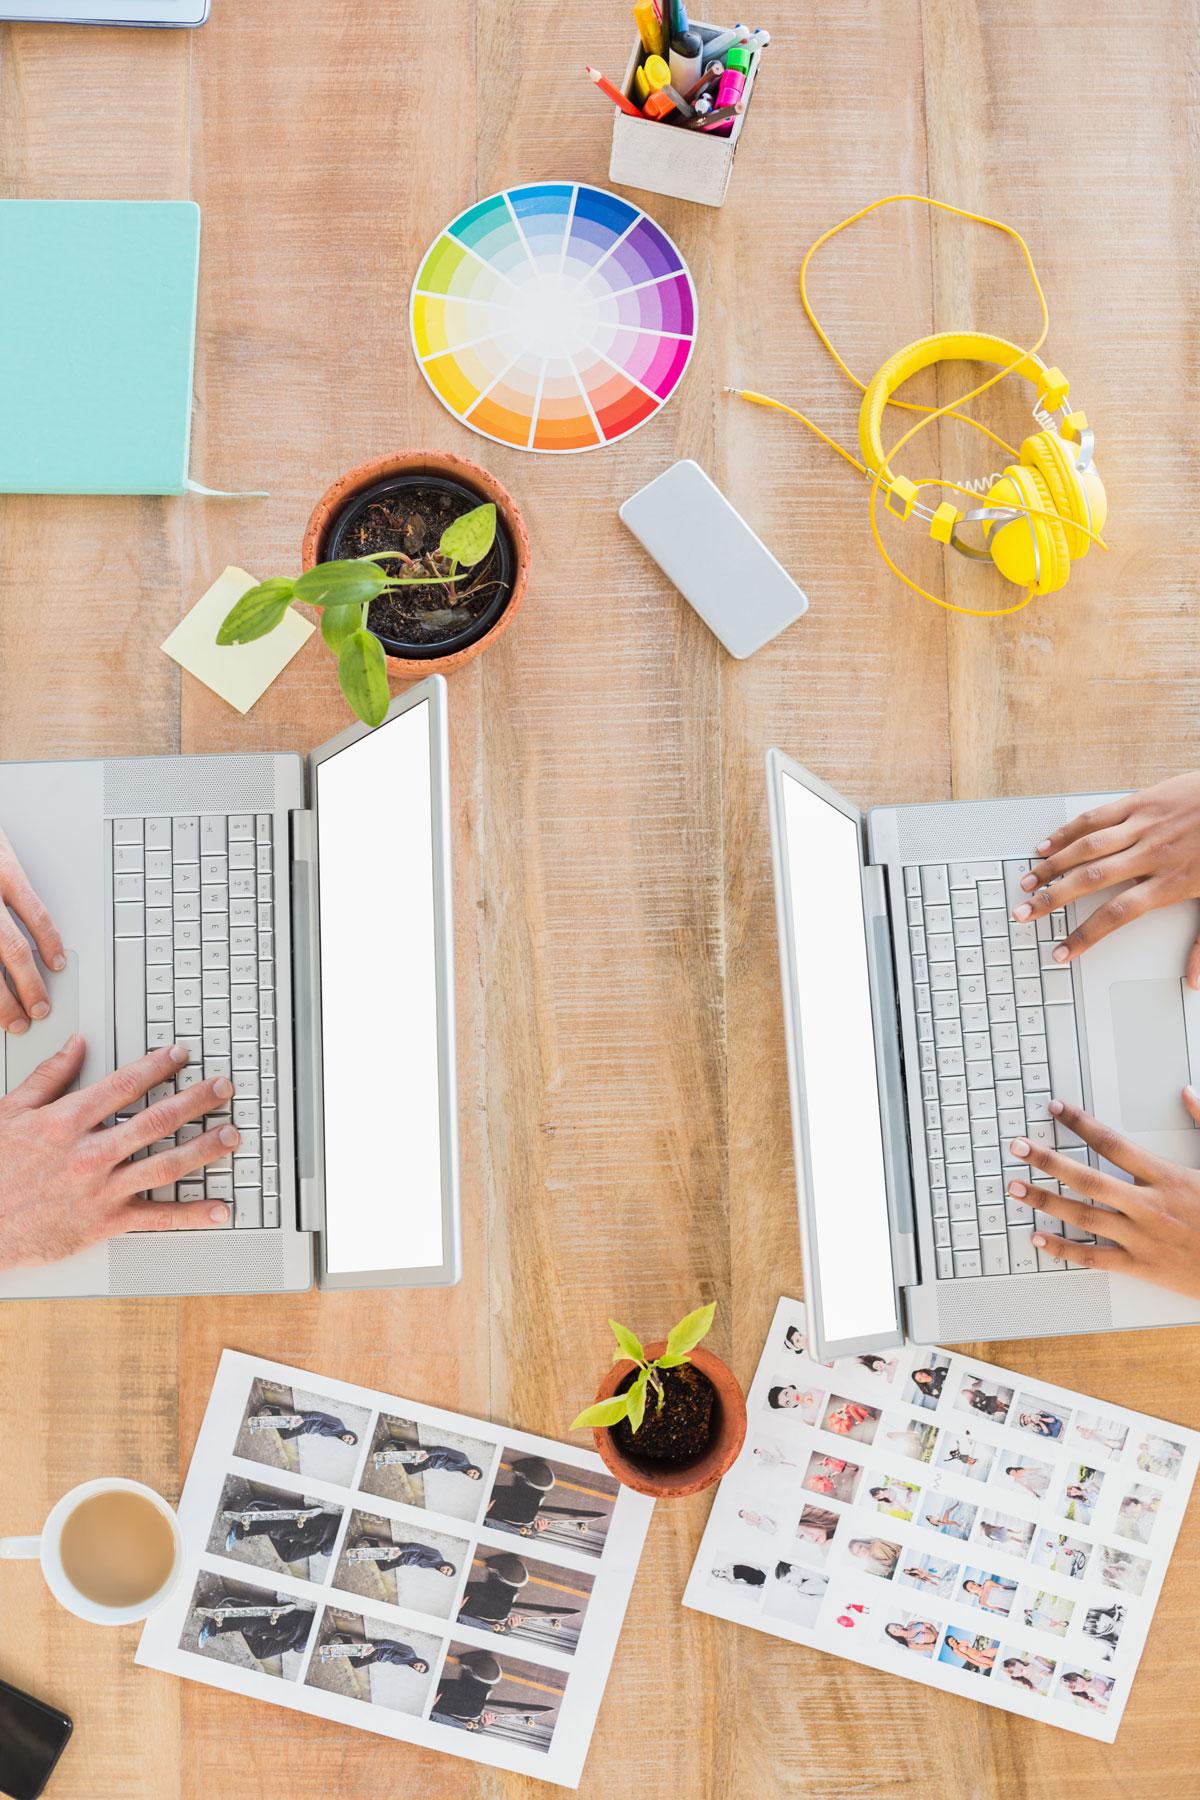 Web Development & Design  E-commerce Solutions  SEO & SEM  Social Media Services  Branding  Mobile Applications  Media Production